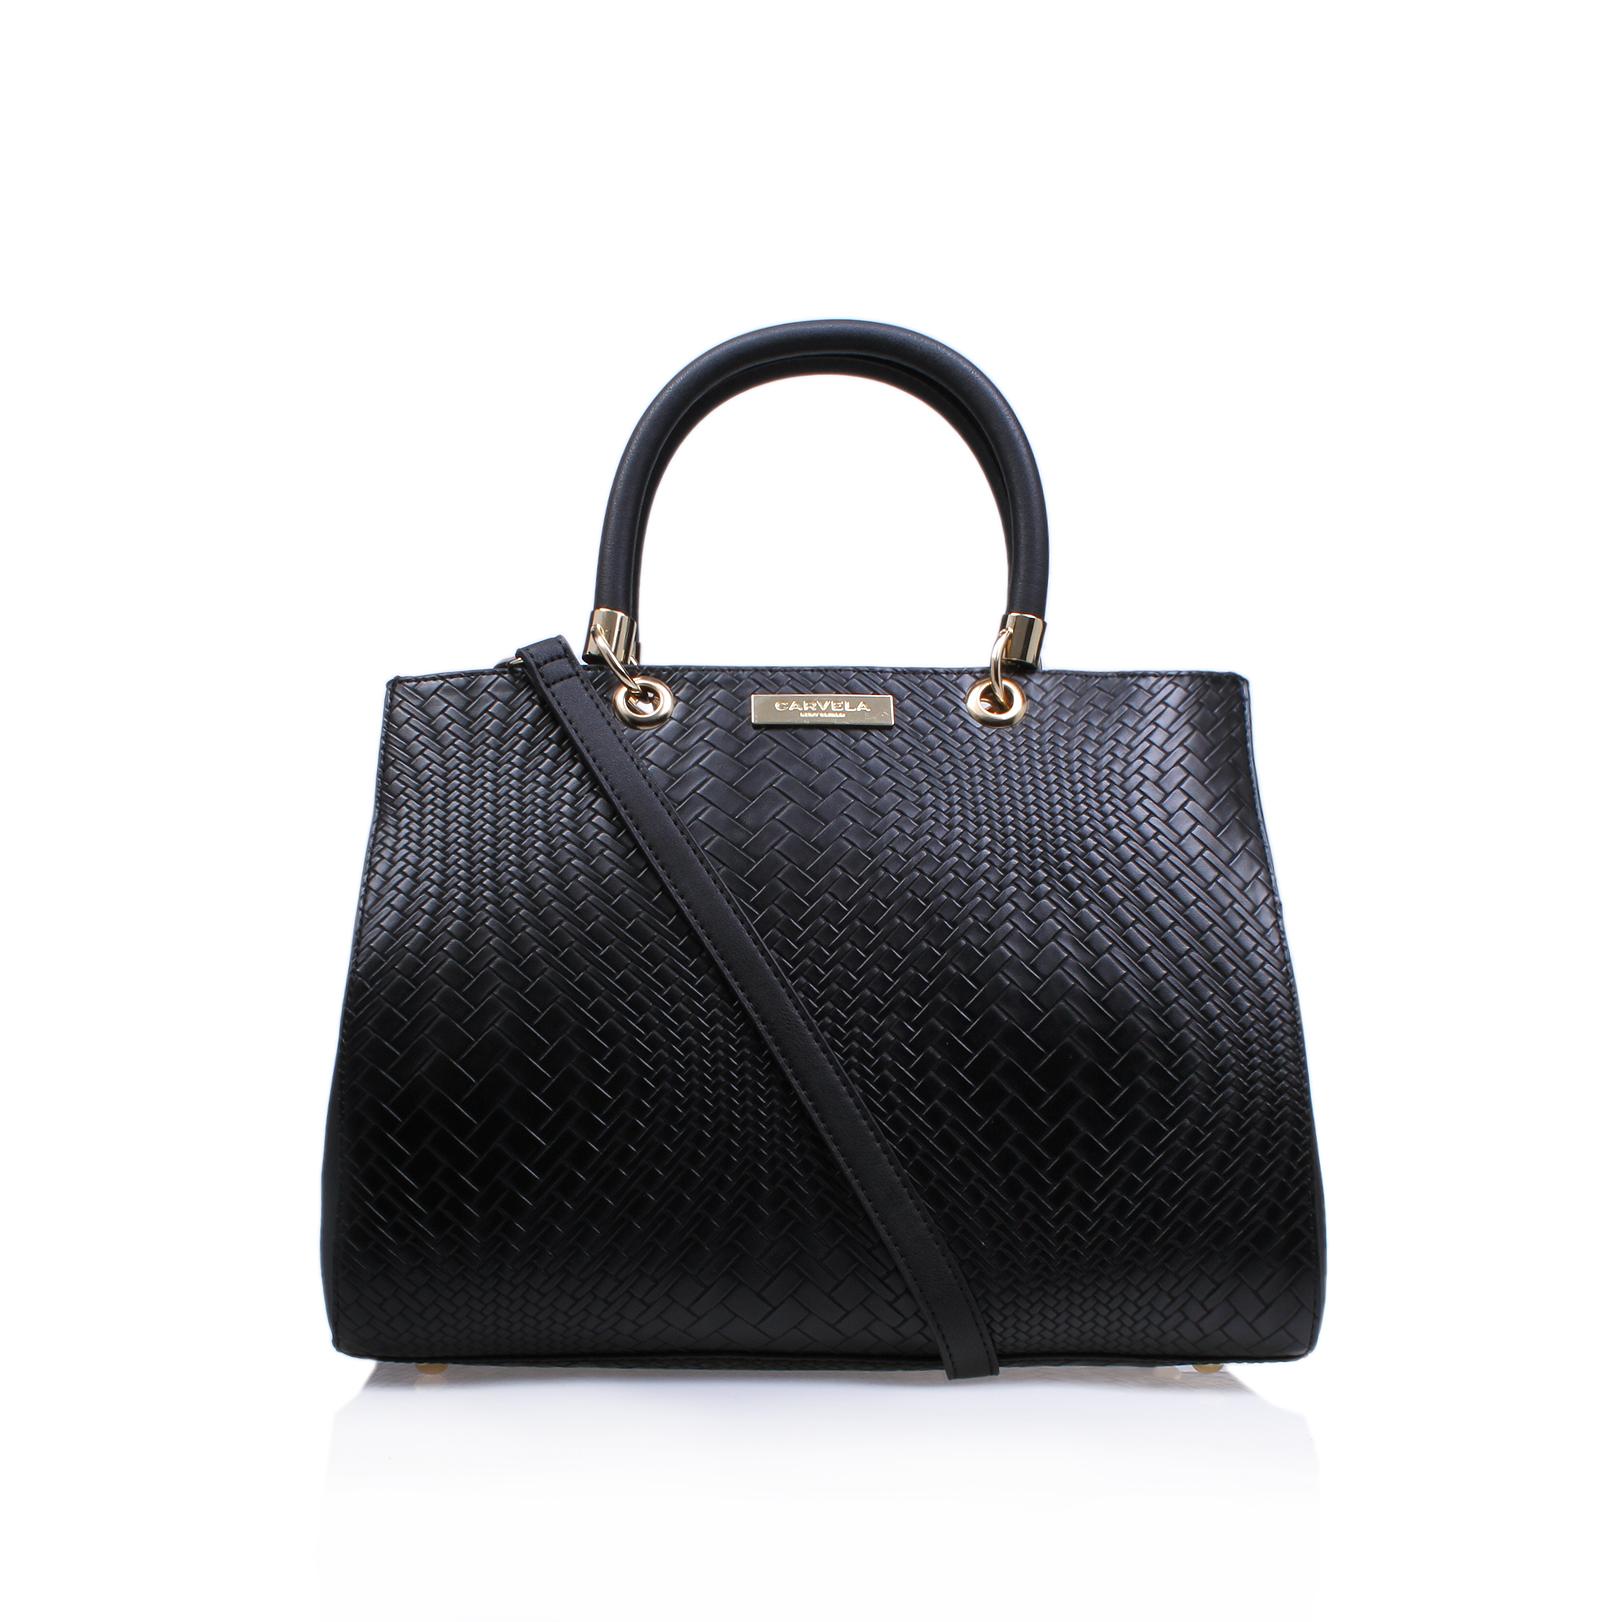 e199d8e901c2 DARLA TEXTURED TOTE Carvela Darla Textured Tote Black Handbag by ...